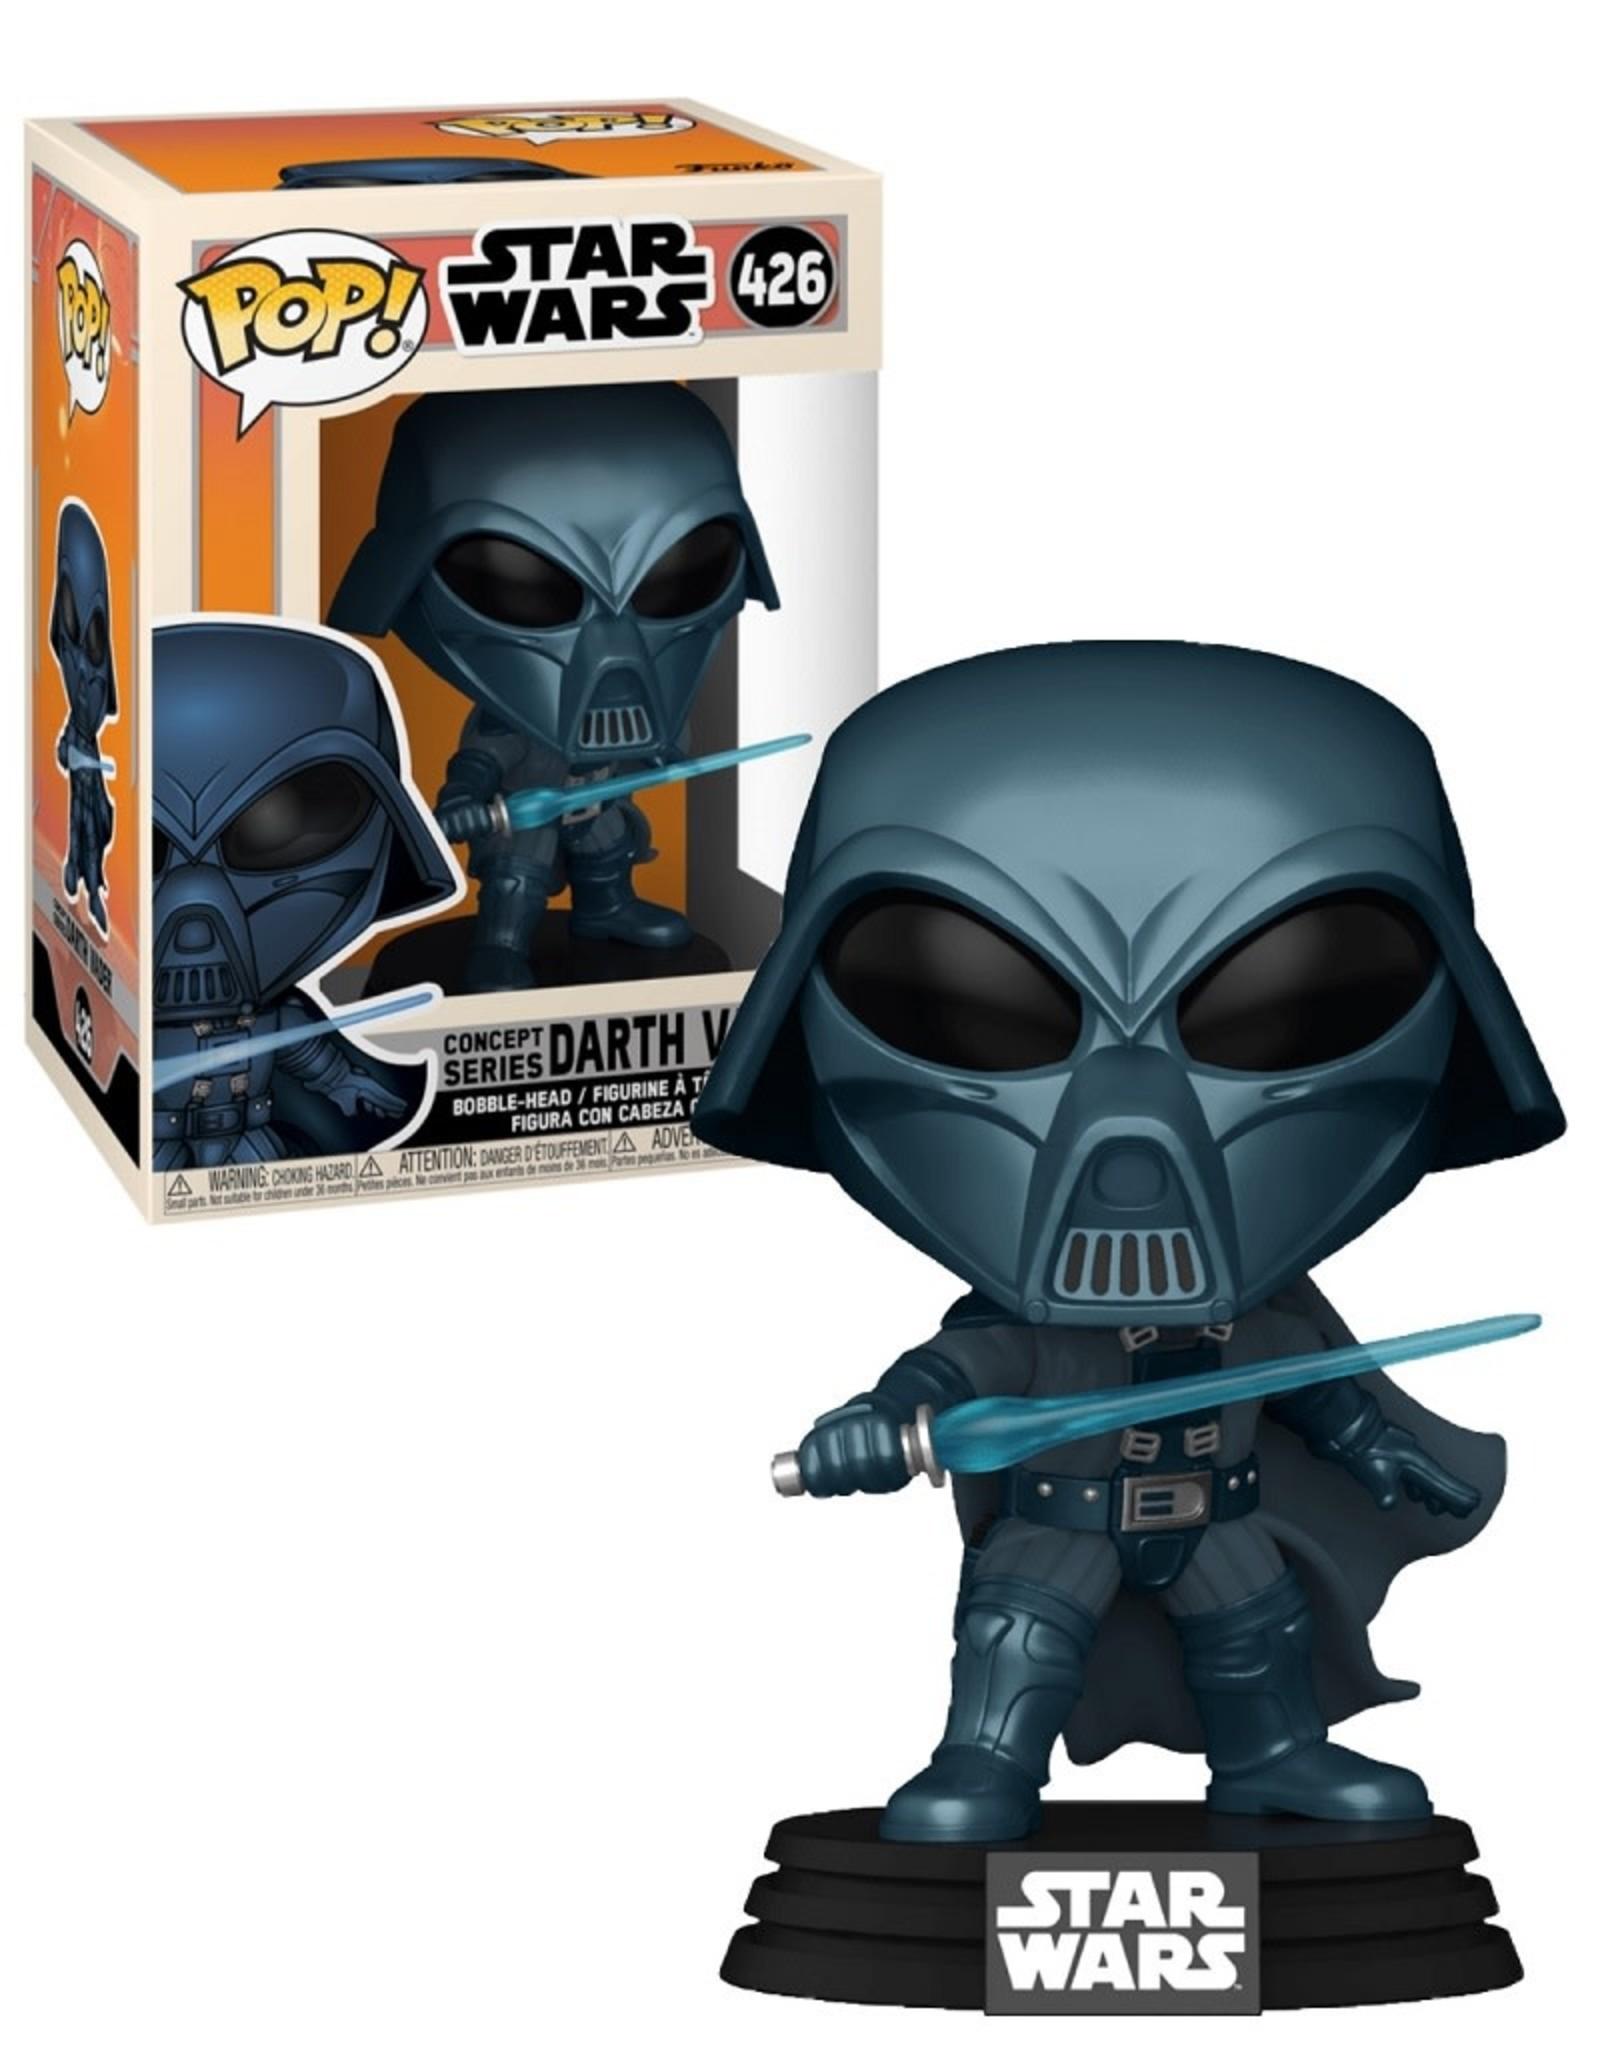 Star Wars 426 ( Funko Pop ) Darth Vader CONCEPT SERIES